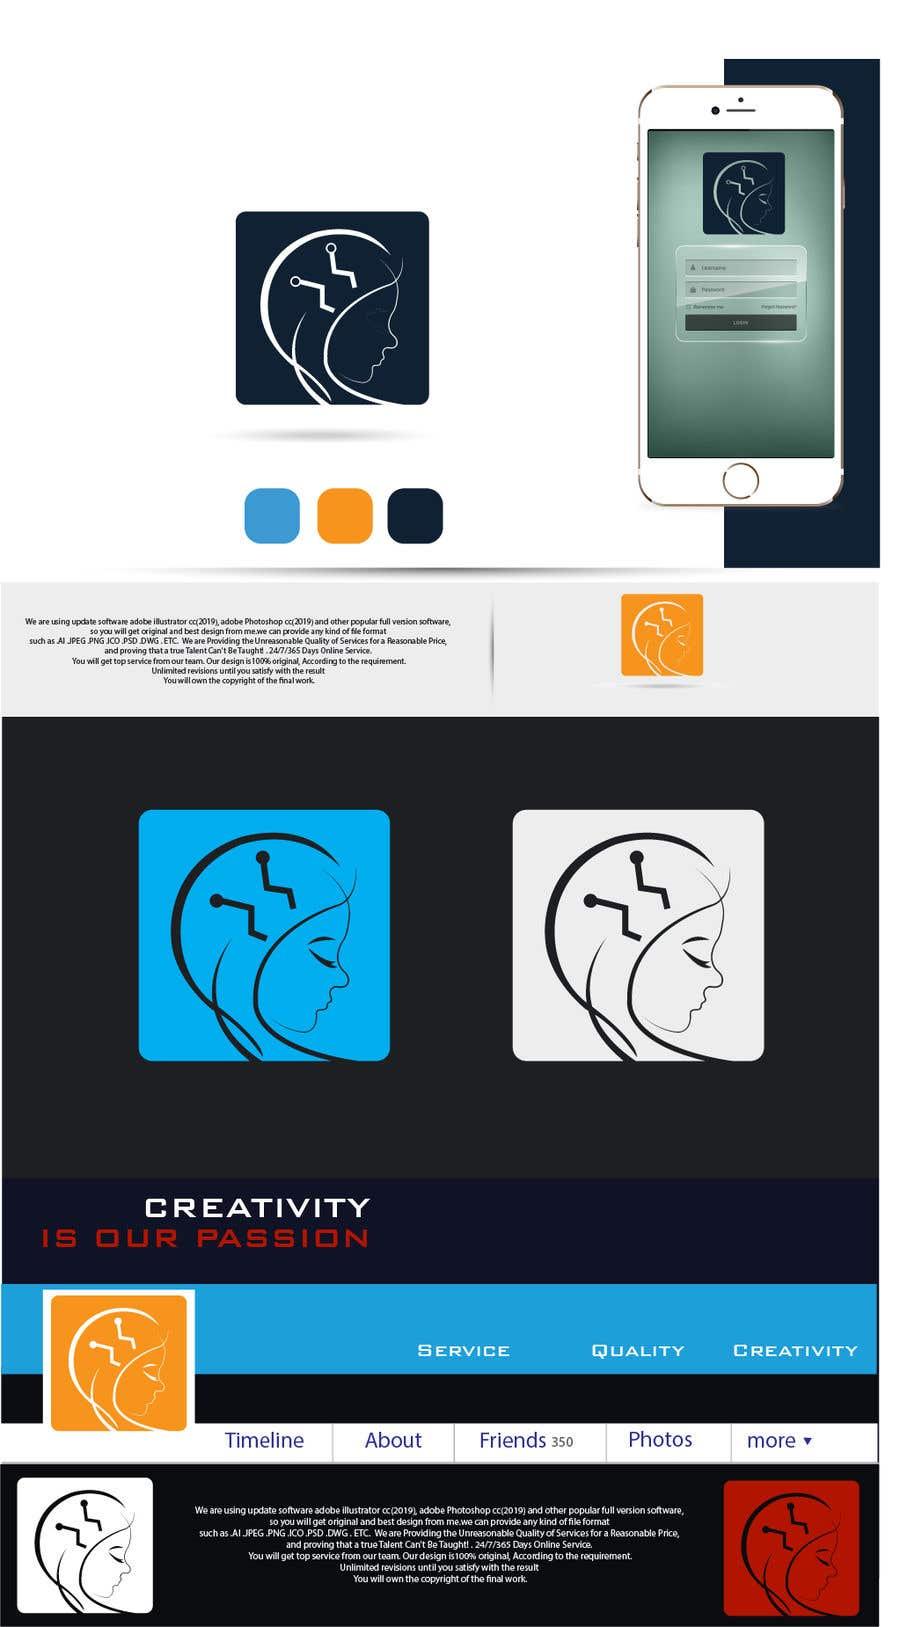 Penyertaan Peraduan #62 untuk Design an App Icon for an IOS App in prerelease stage